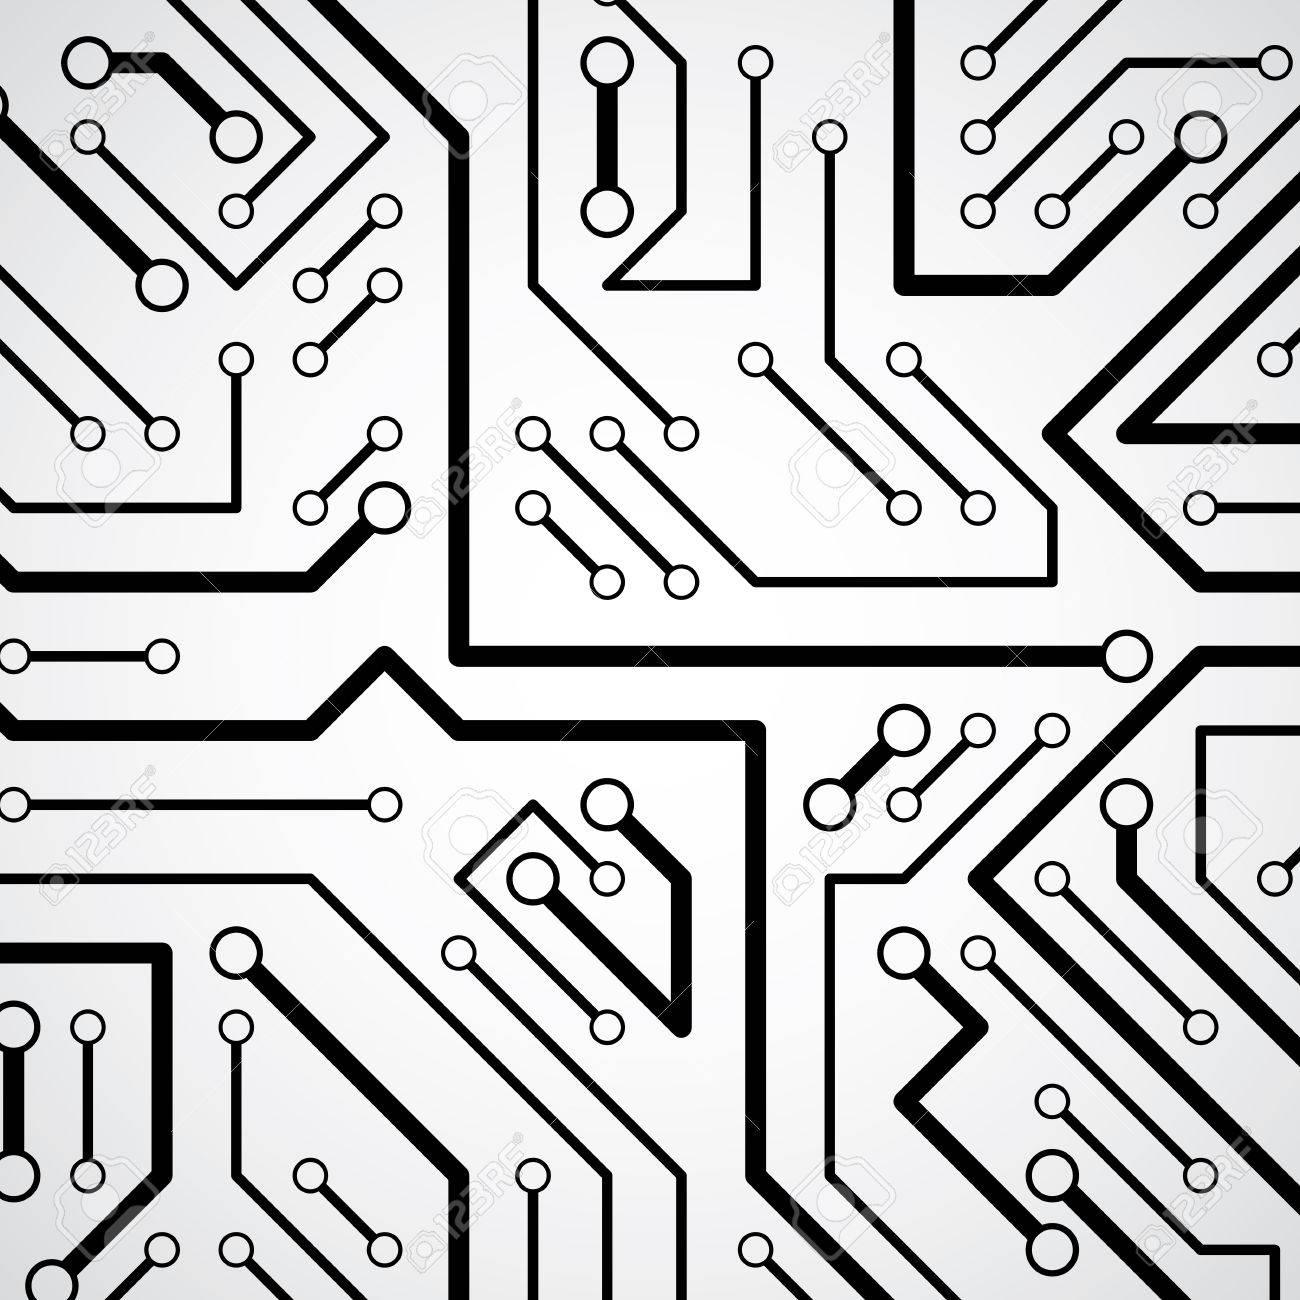 1300x1300 Circuit Board Futuristic Cybernetic Texture, Information